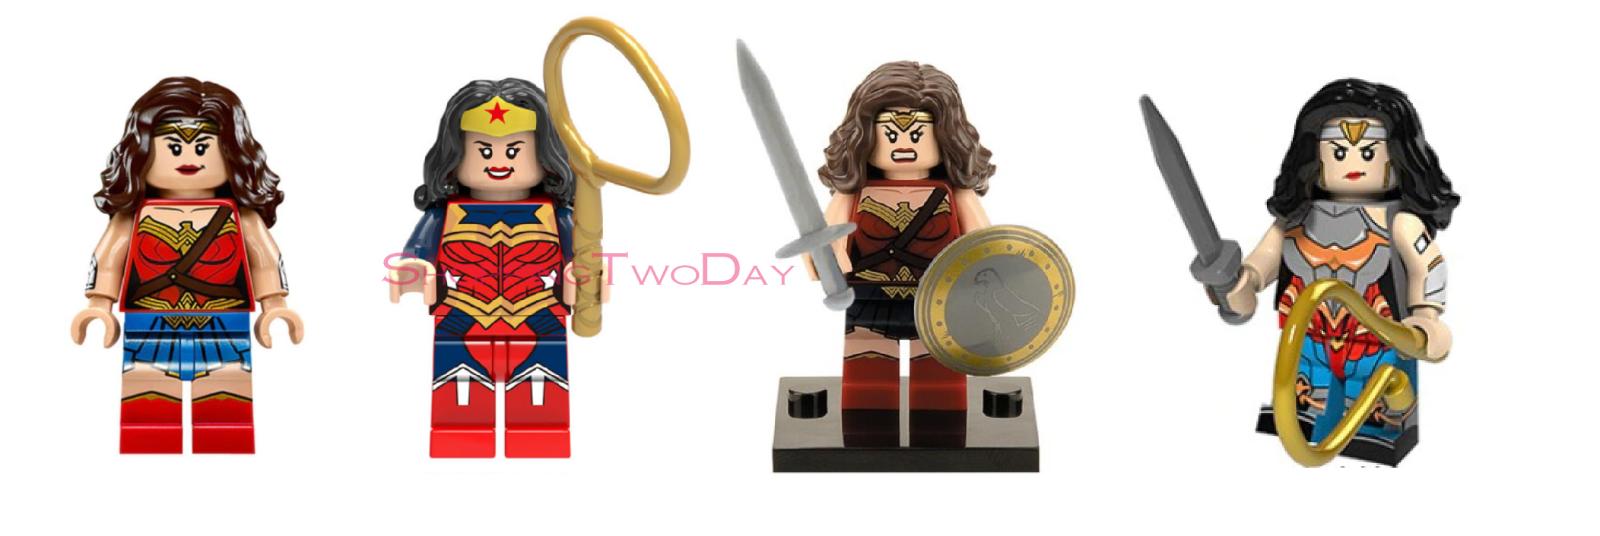 WONDER WOMAN DC LEGO MOC CUSTOM MINIFIGURE TOYS COLLECTION GIFT